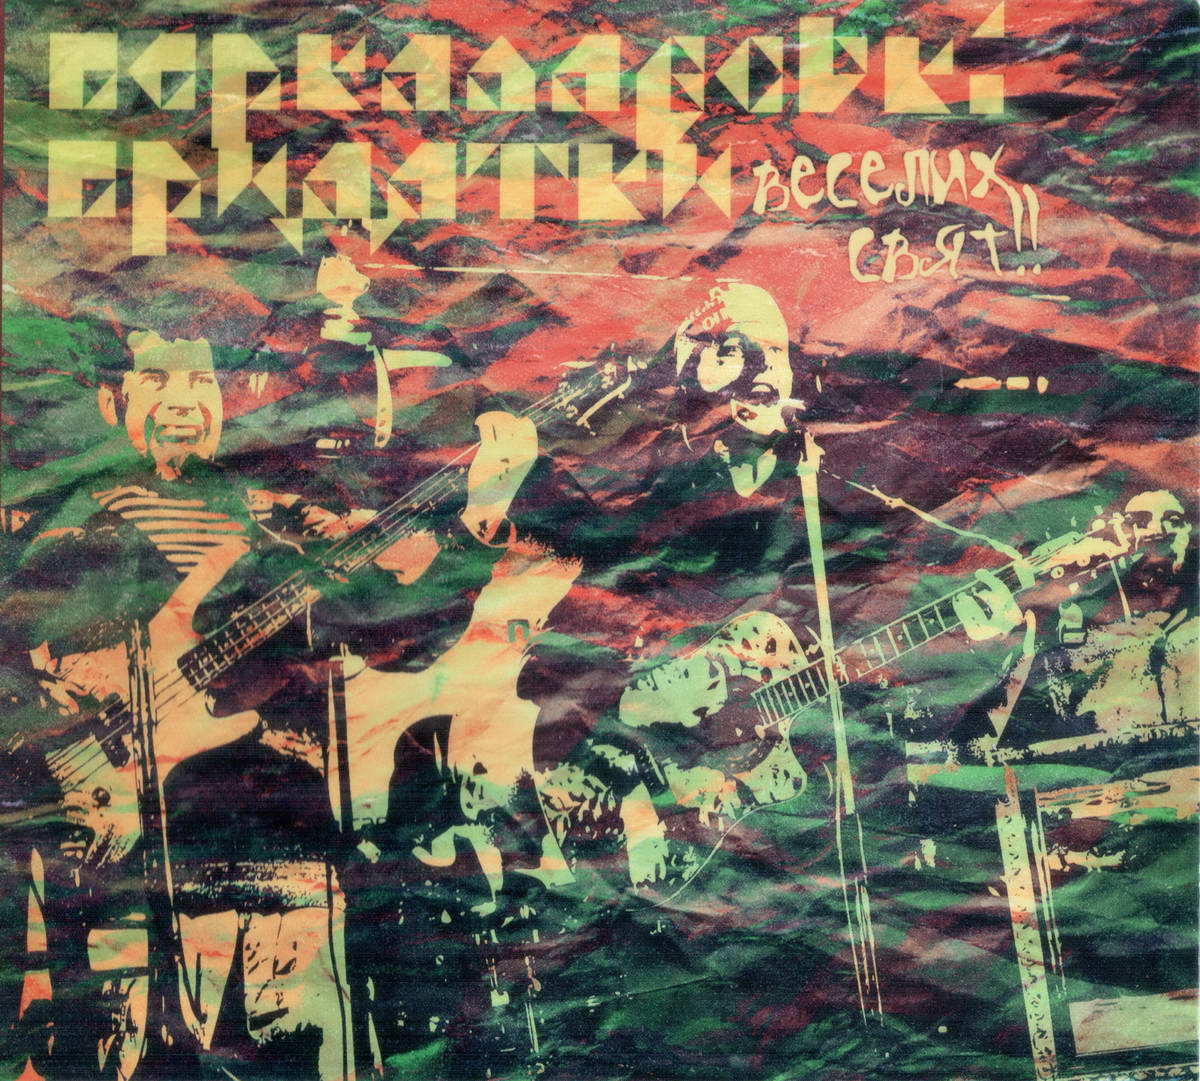 Перкалабські придатки - 2012 Веселих свят